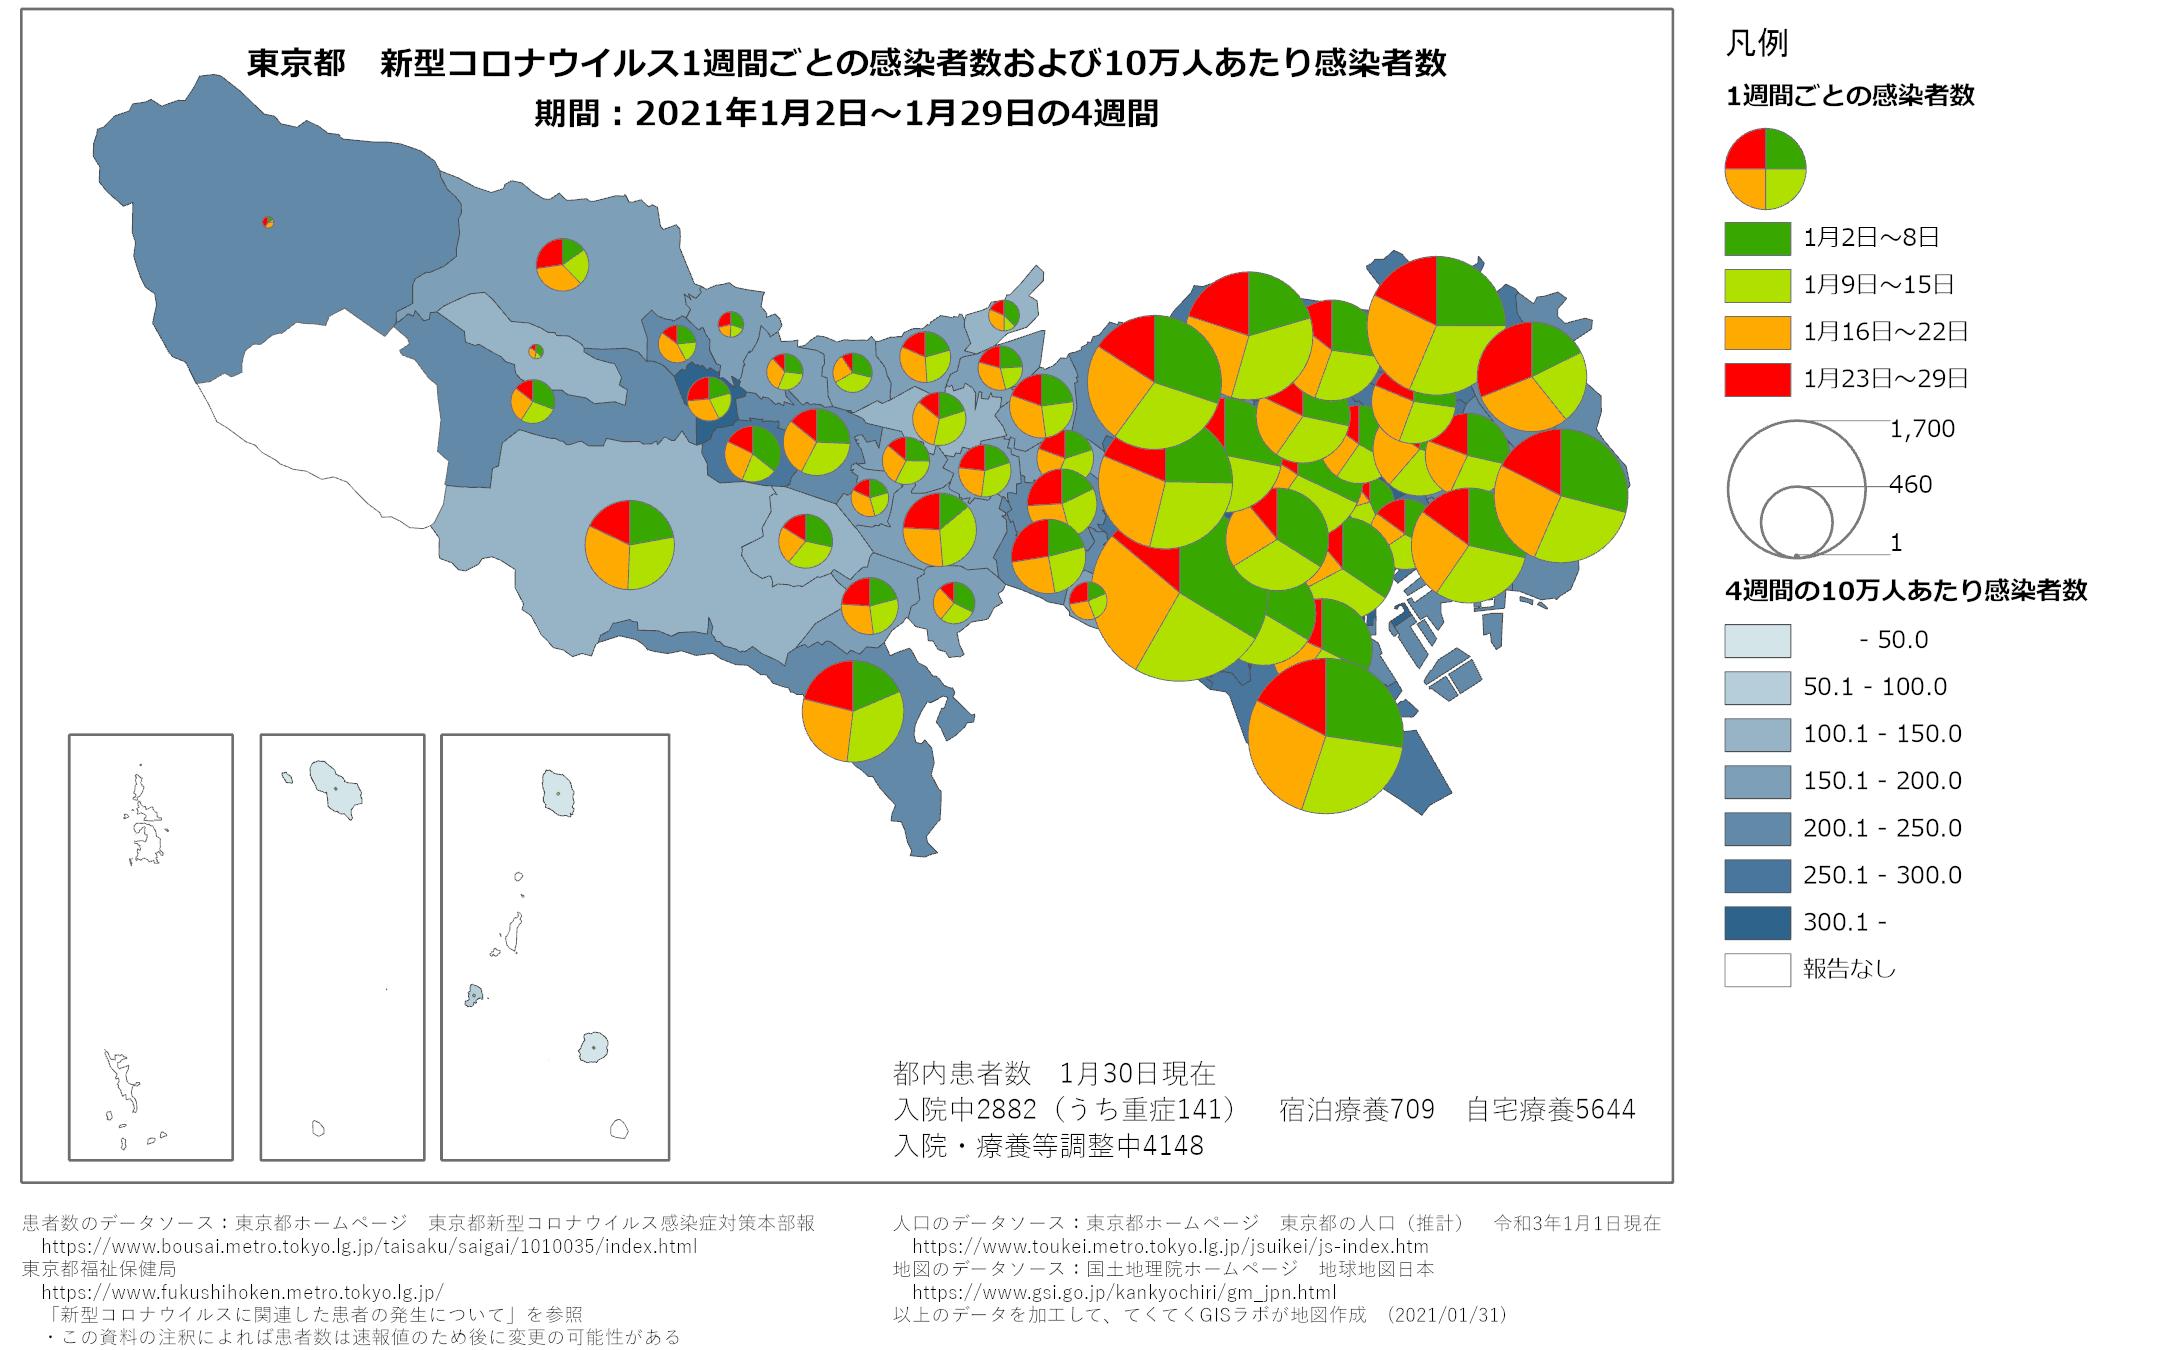 1週間ごと感染者数、東京都、1月2日〜1月29日